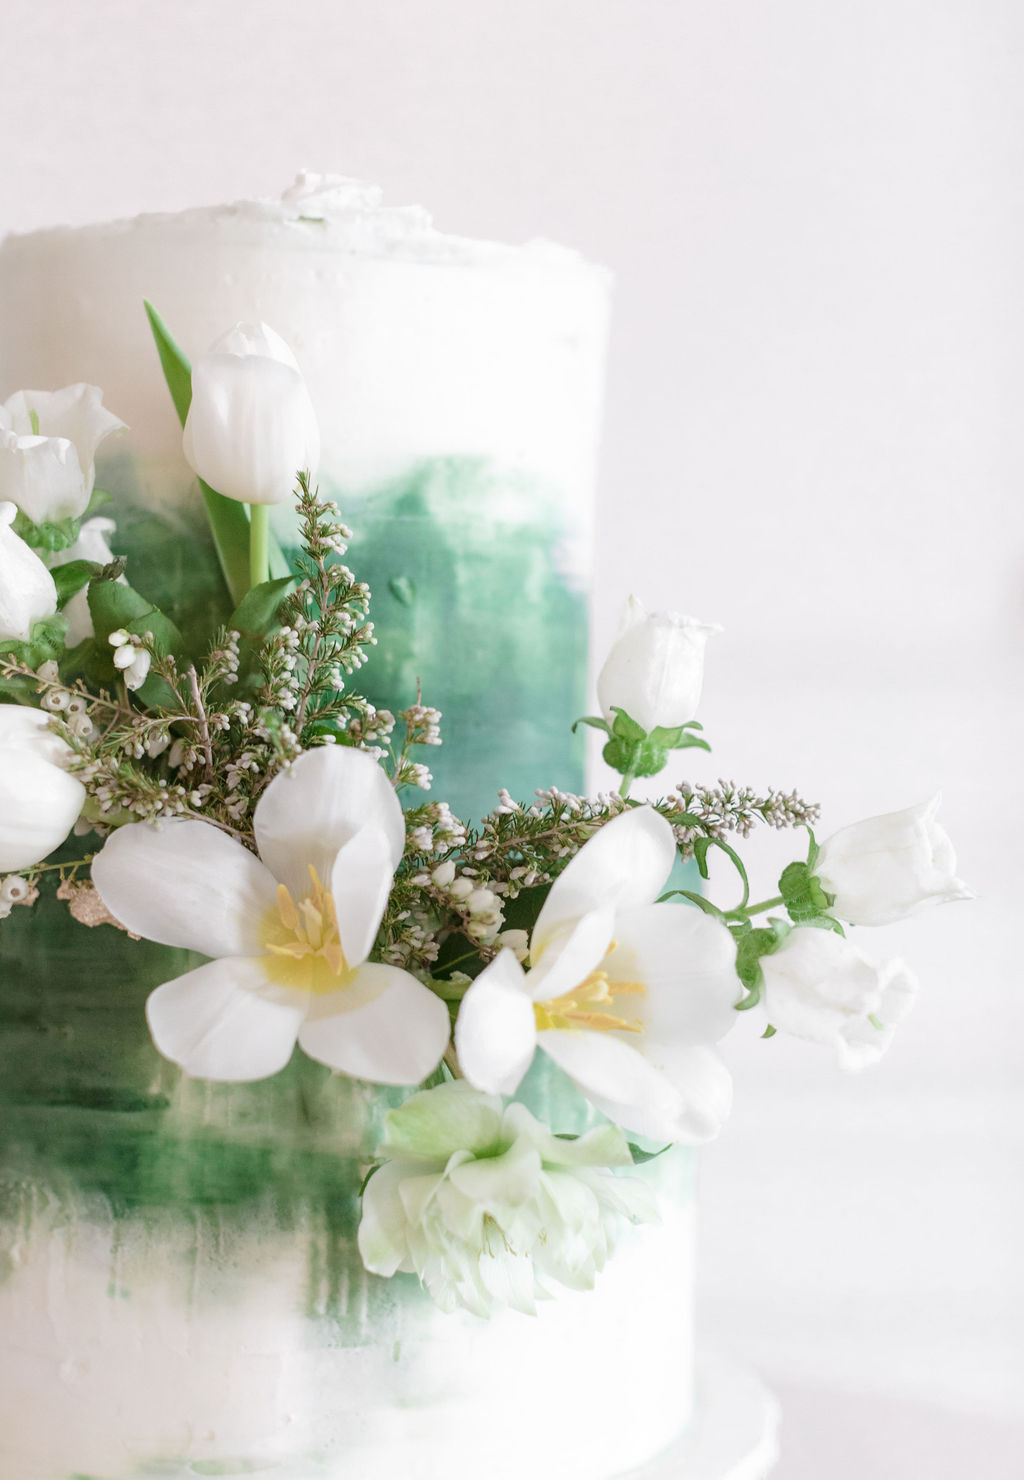 Butterfly Cakery wedding cake design: Elegant Dallas Wedding Inspiration at The Mason featured on Alexa Kay Events